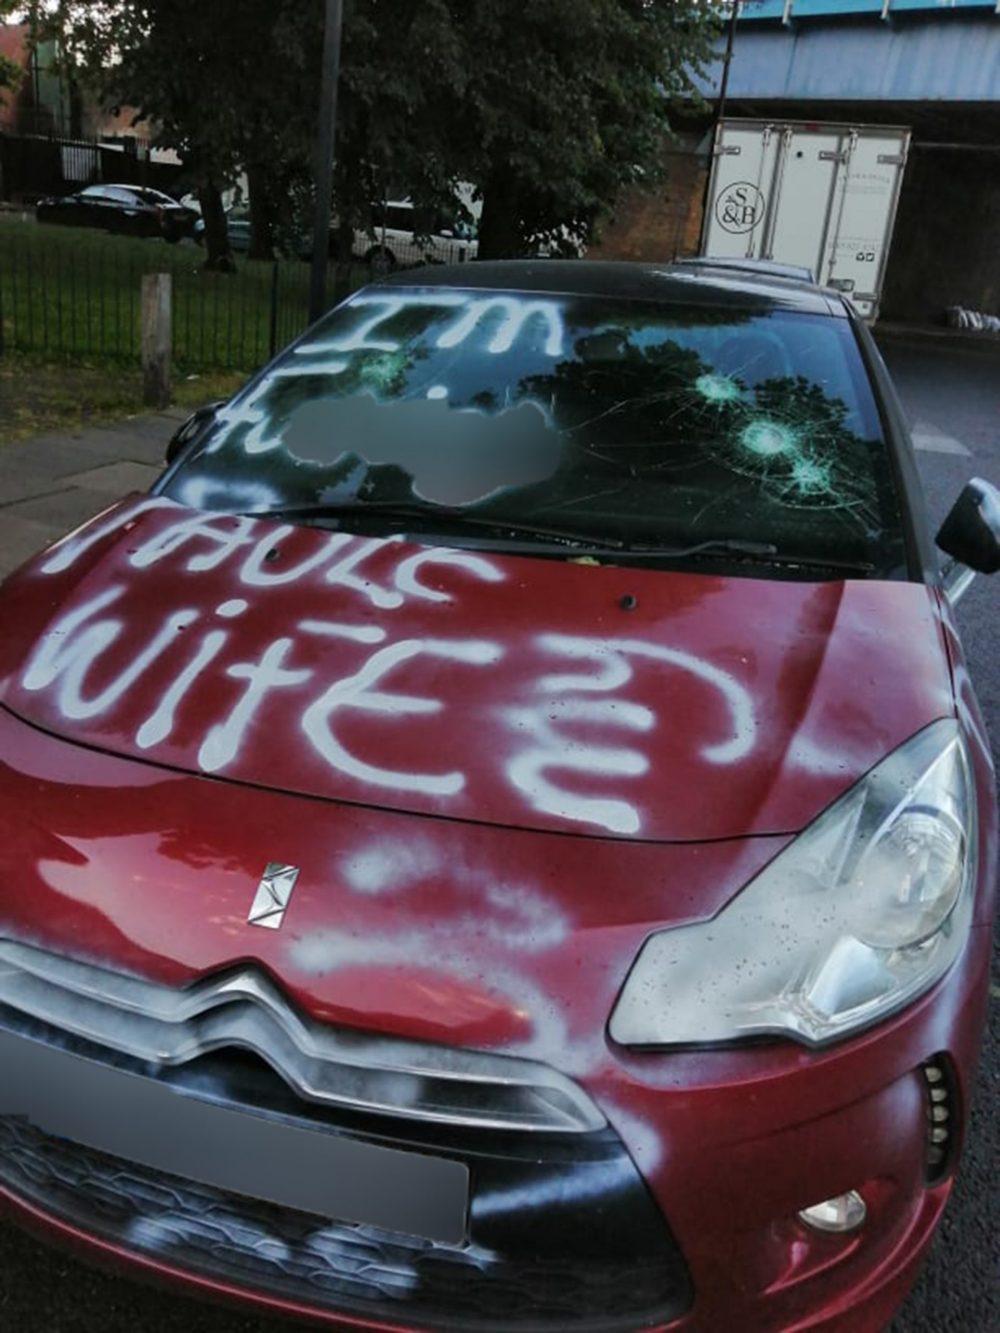 The red Citroen covered in white graffiti -London Crime News